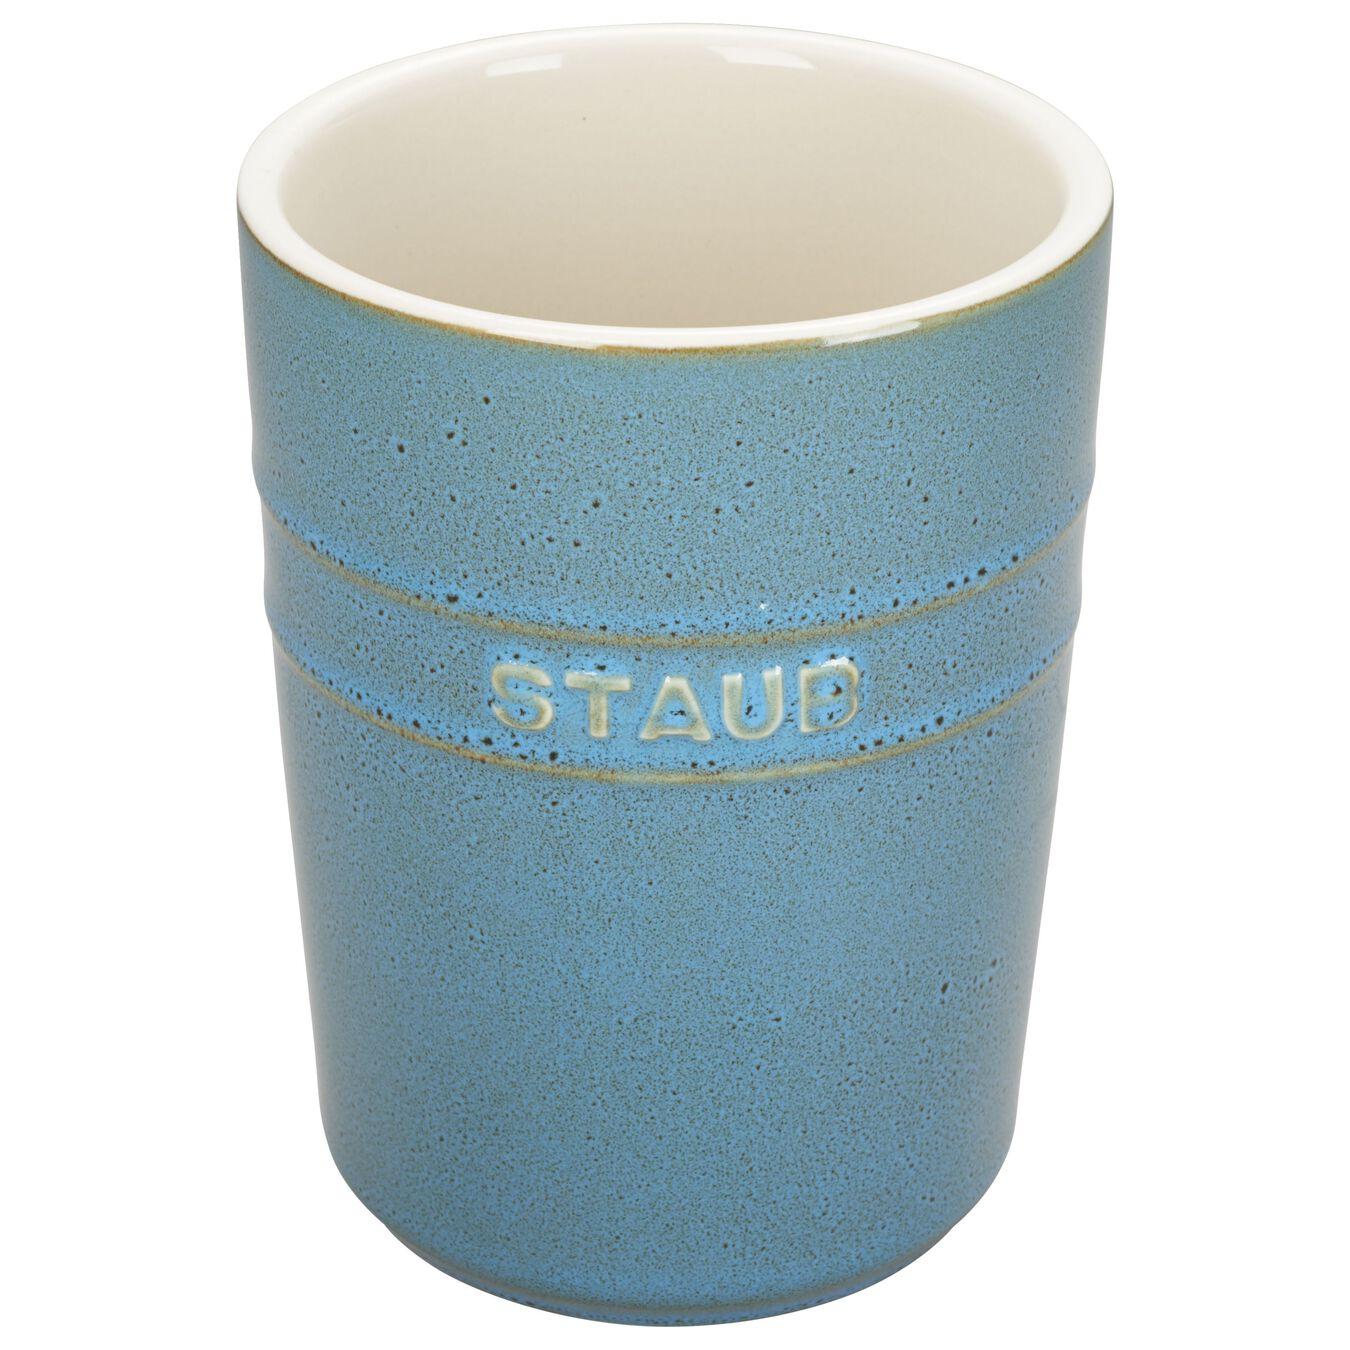 Utensil Holder - Rustic Turquoise,,large 1